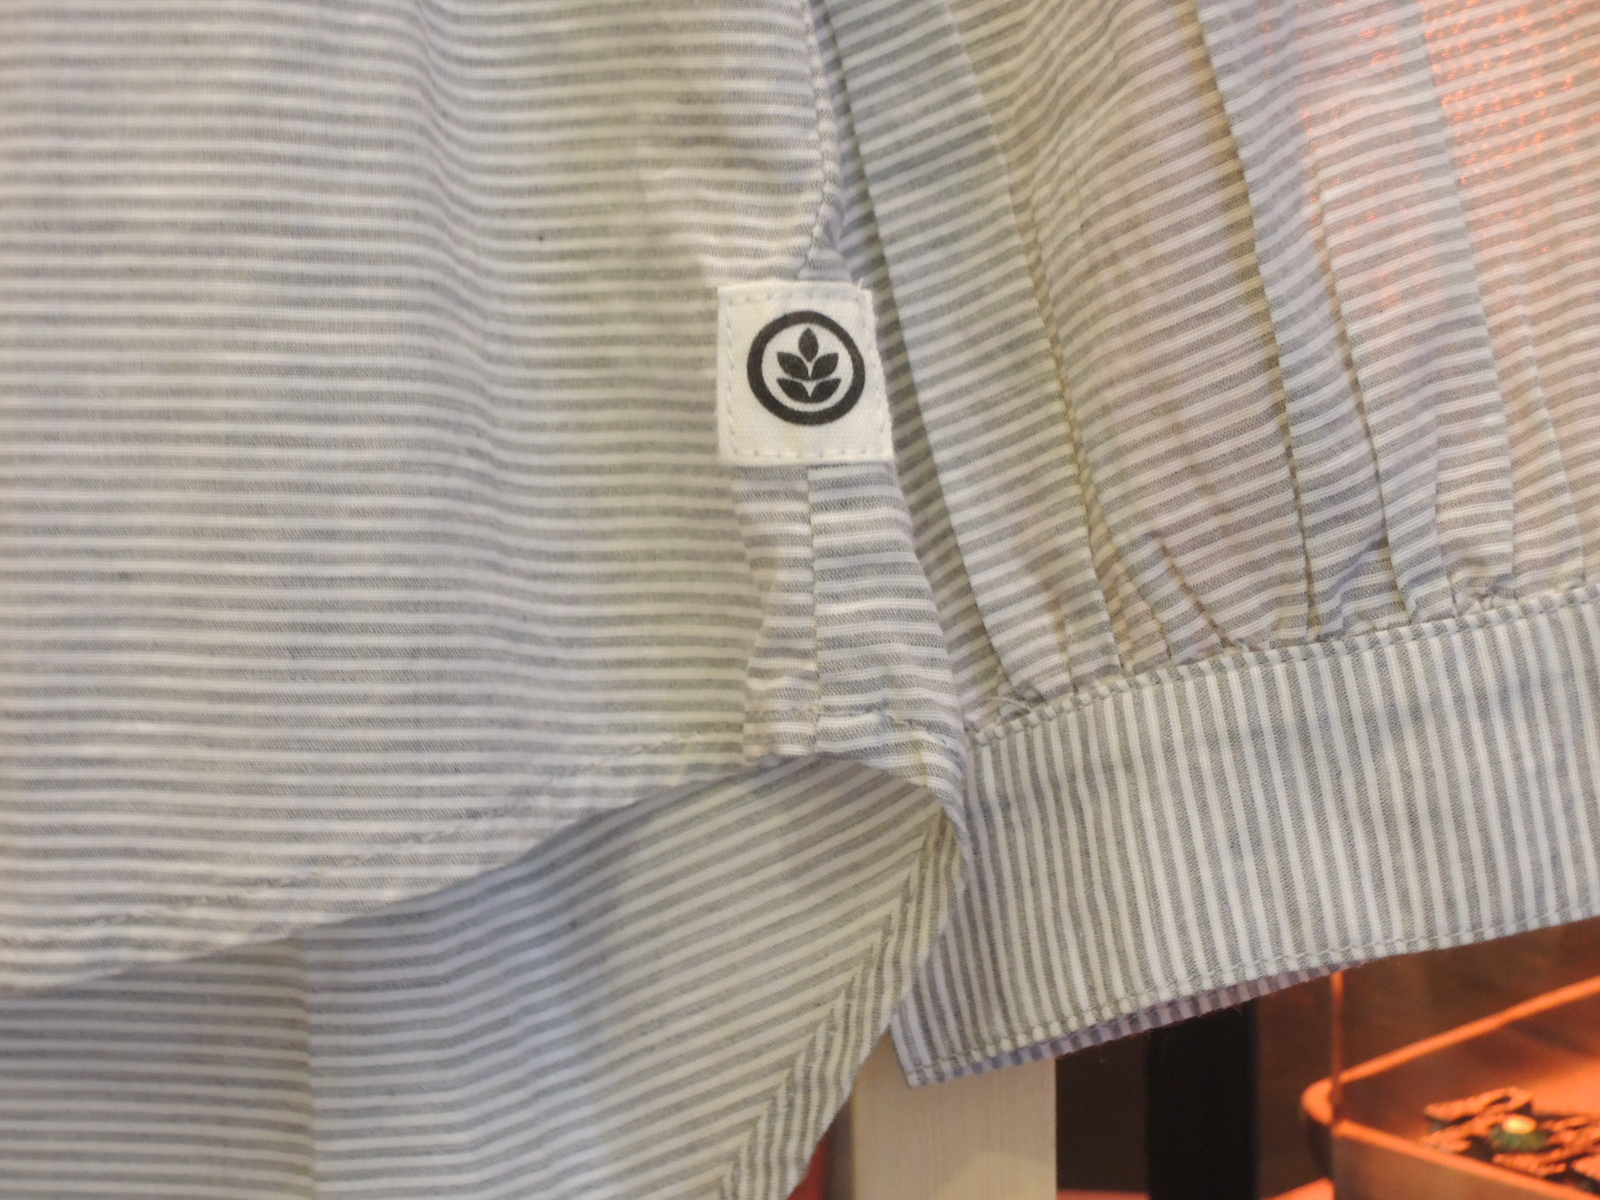 evershirts06.JPG